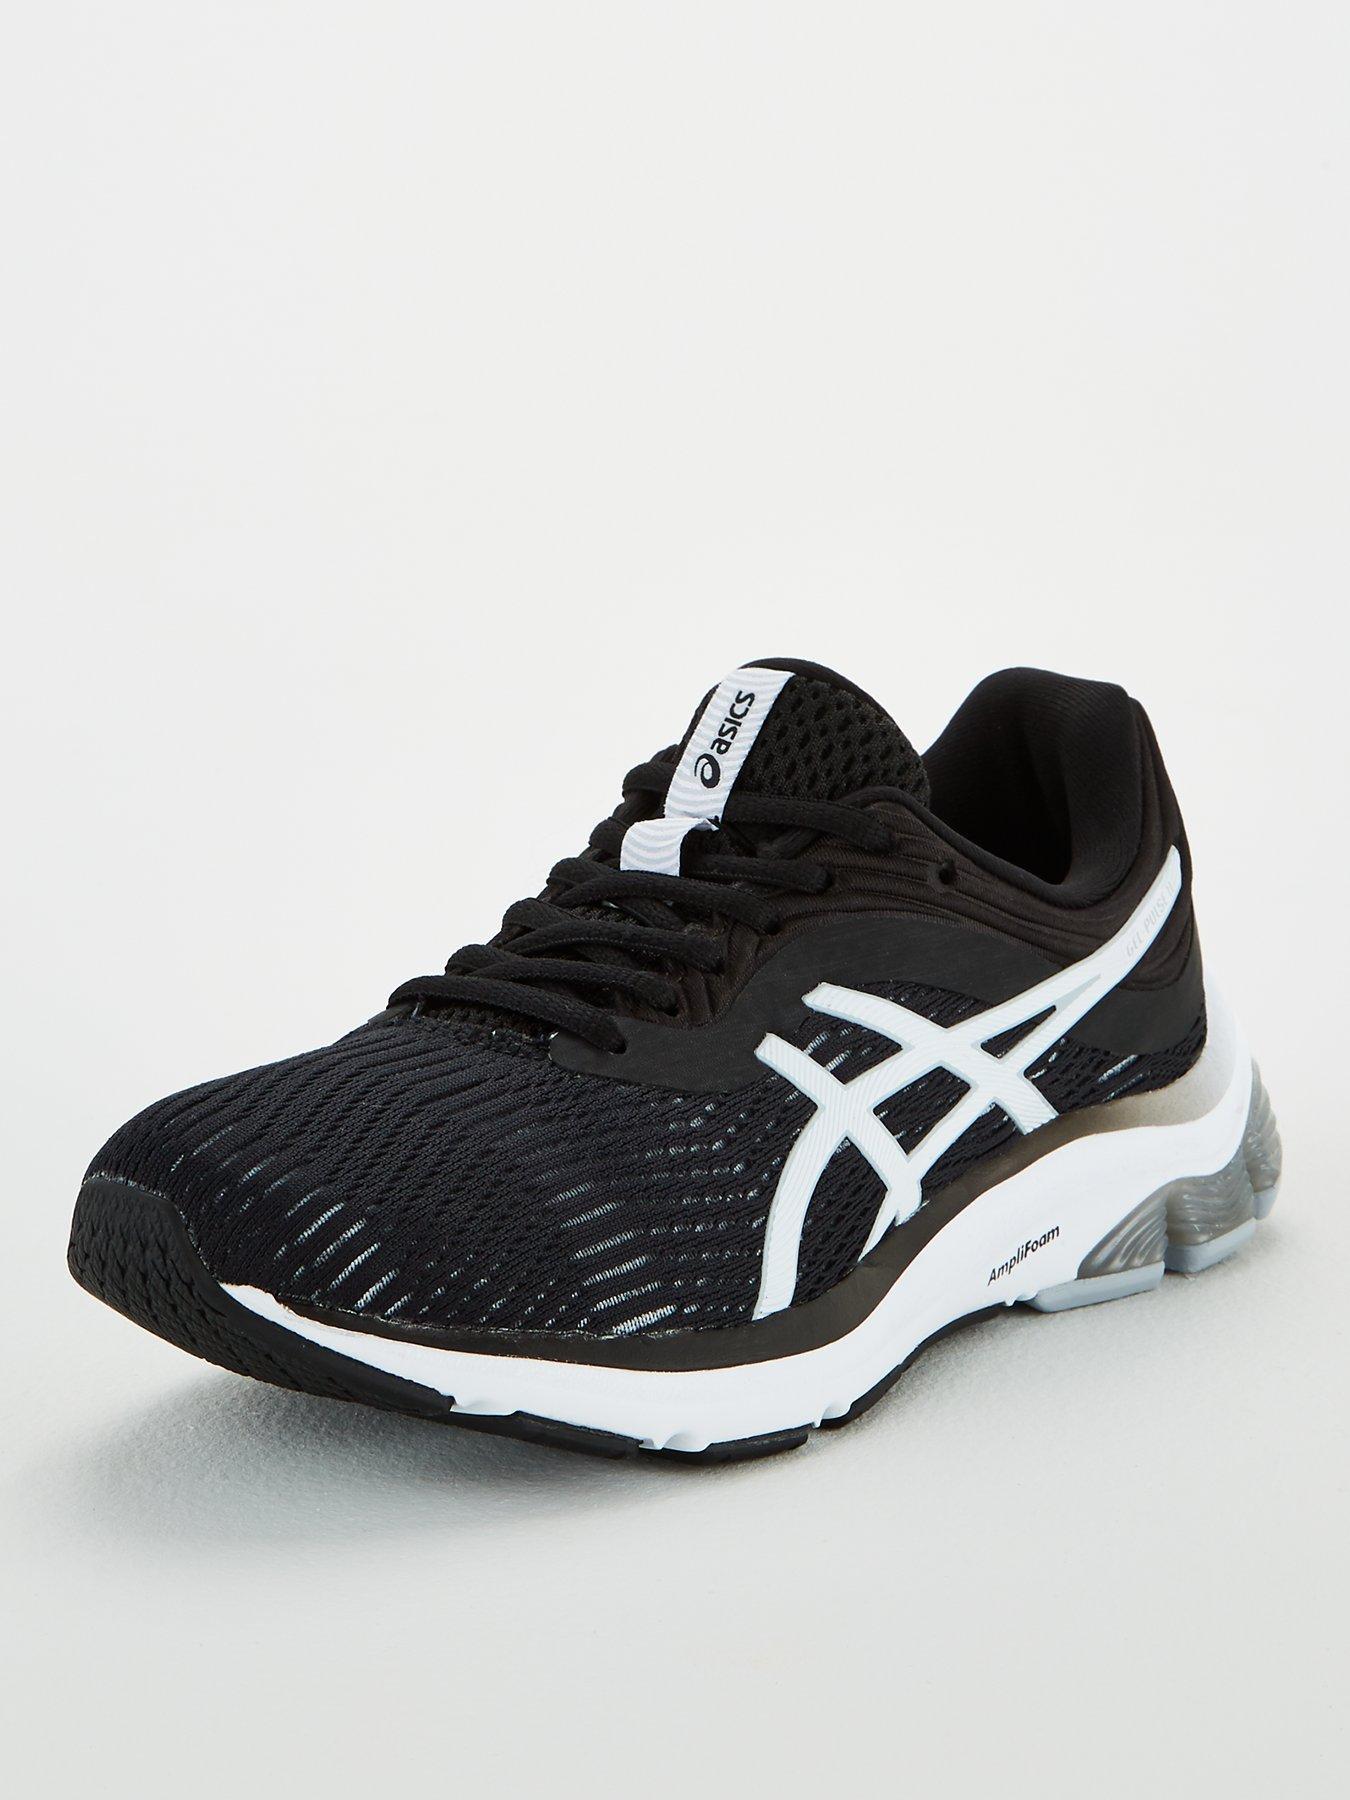 asics gel stormer 2 running shoes ladies